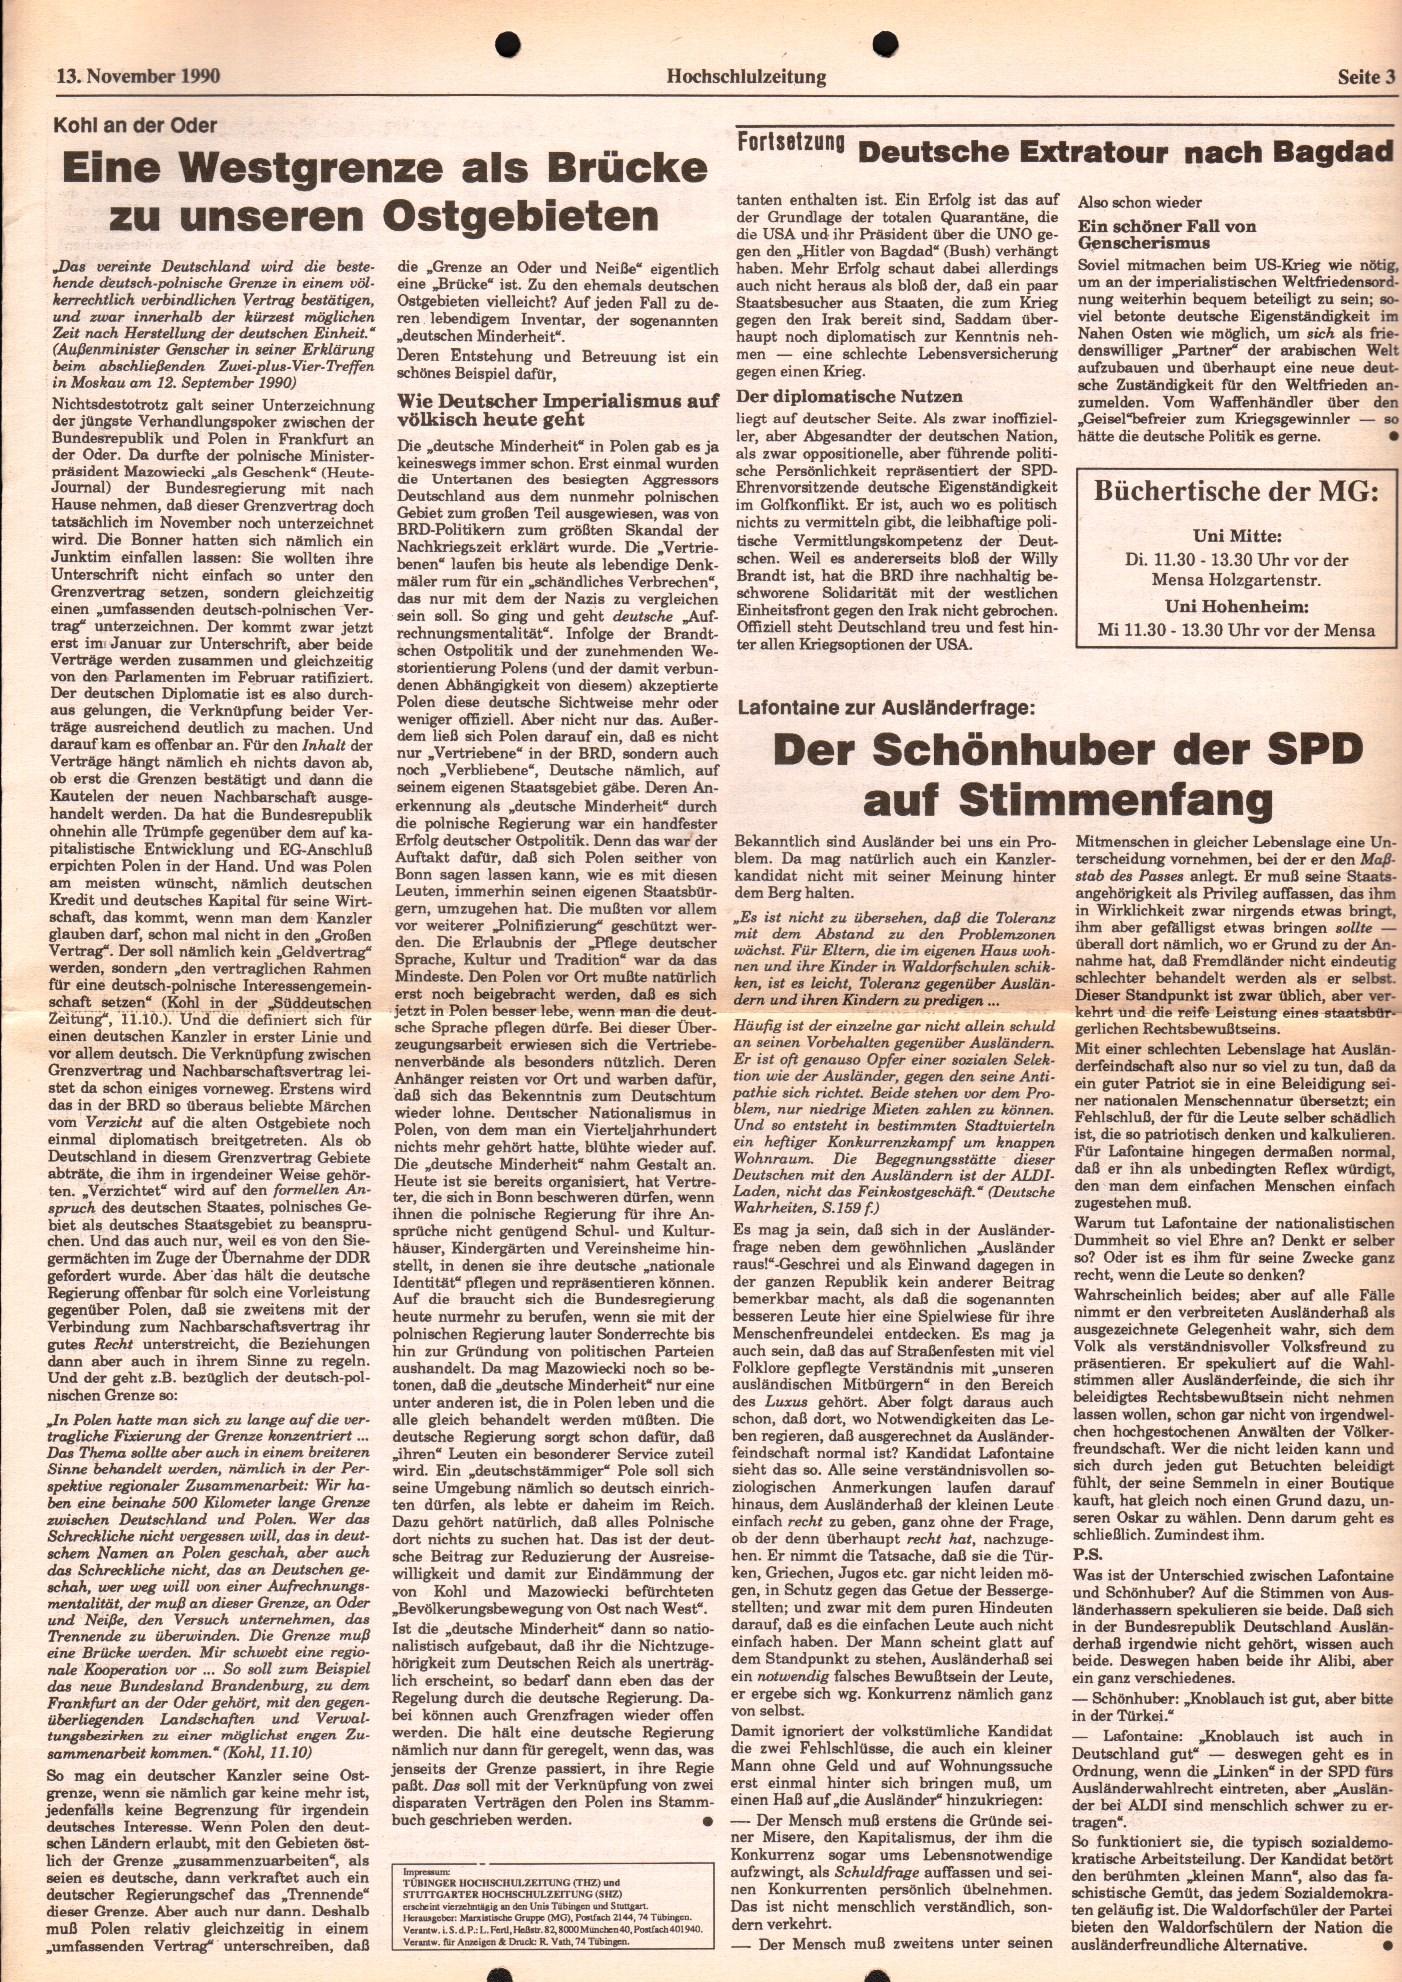 Stuttgart_MG_Hochschulzeitung_1990_12_03